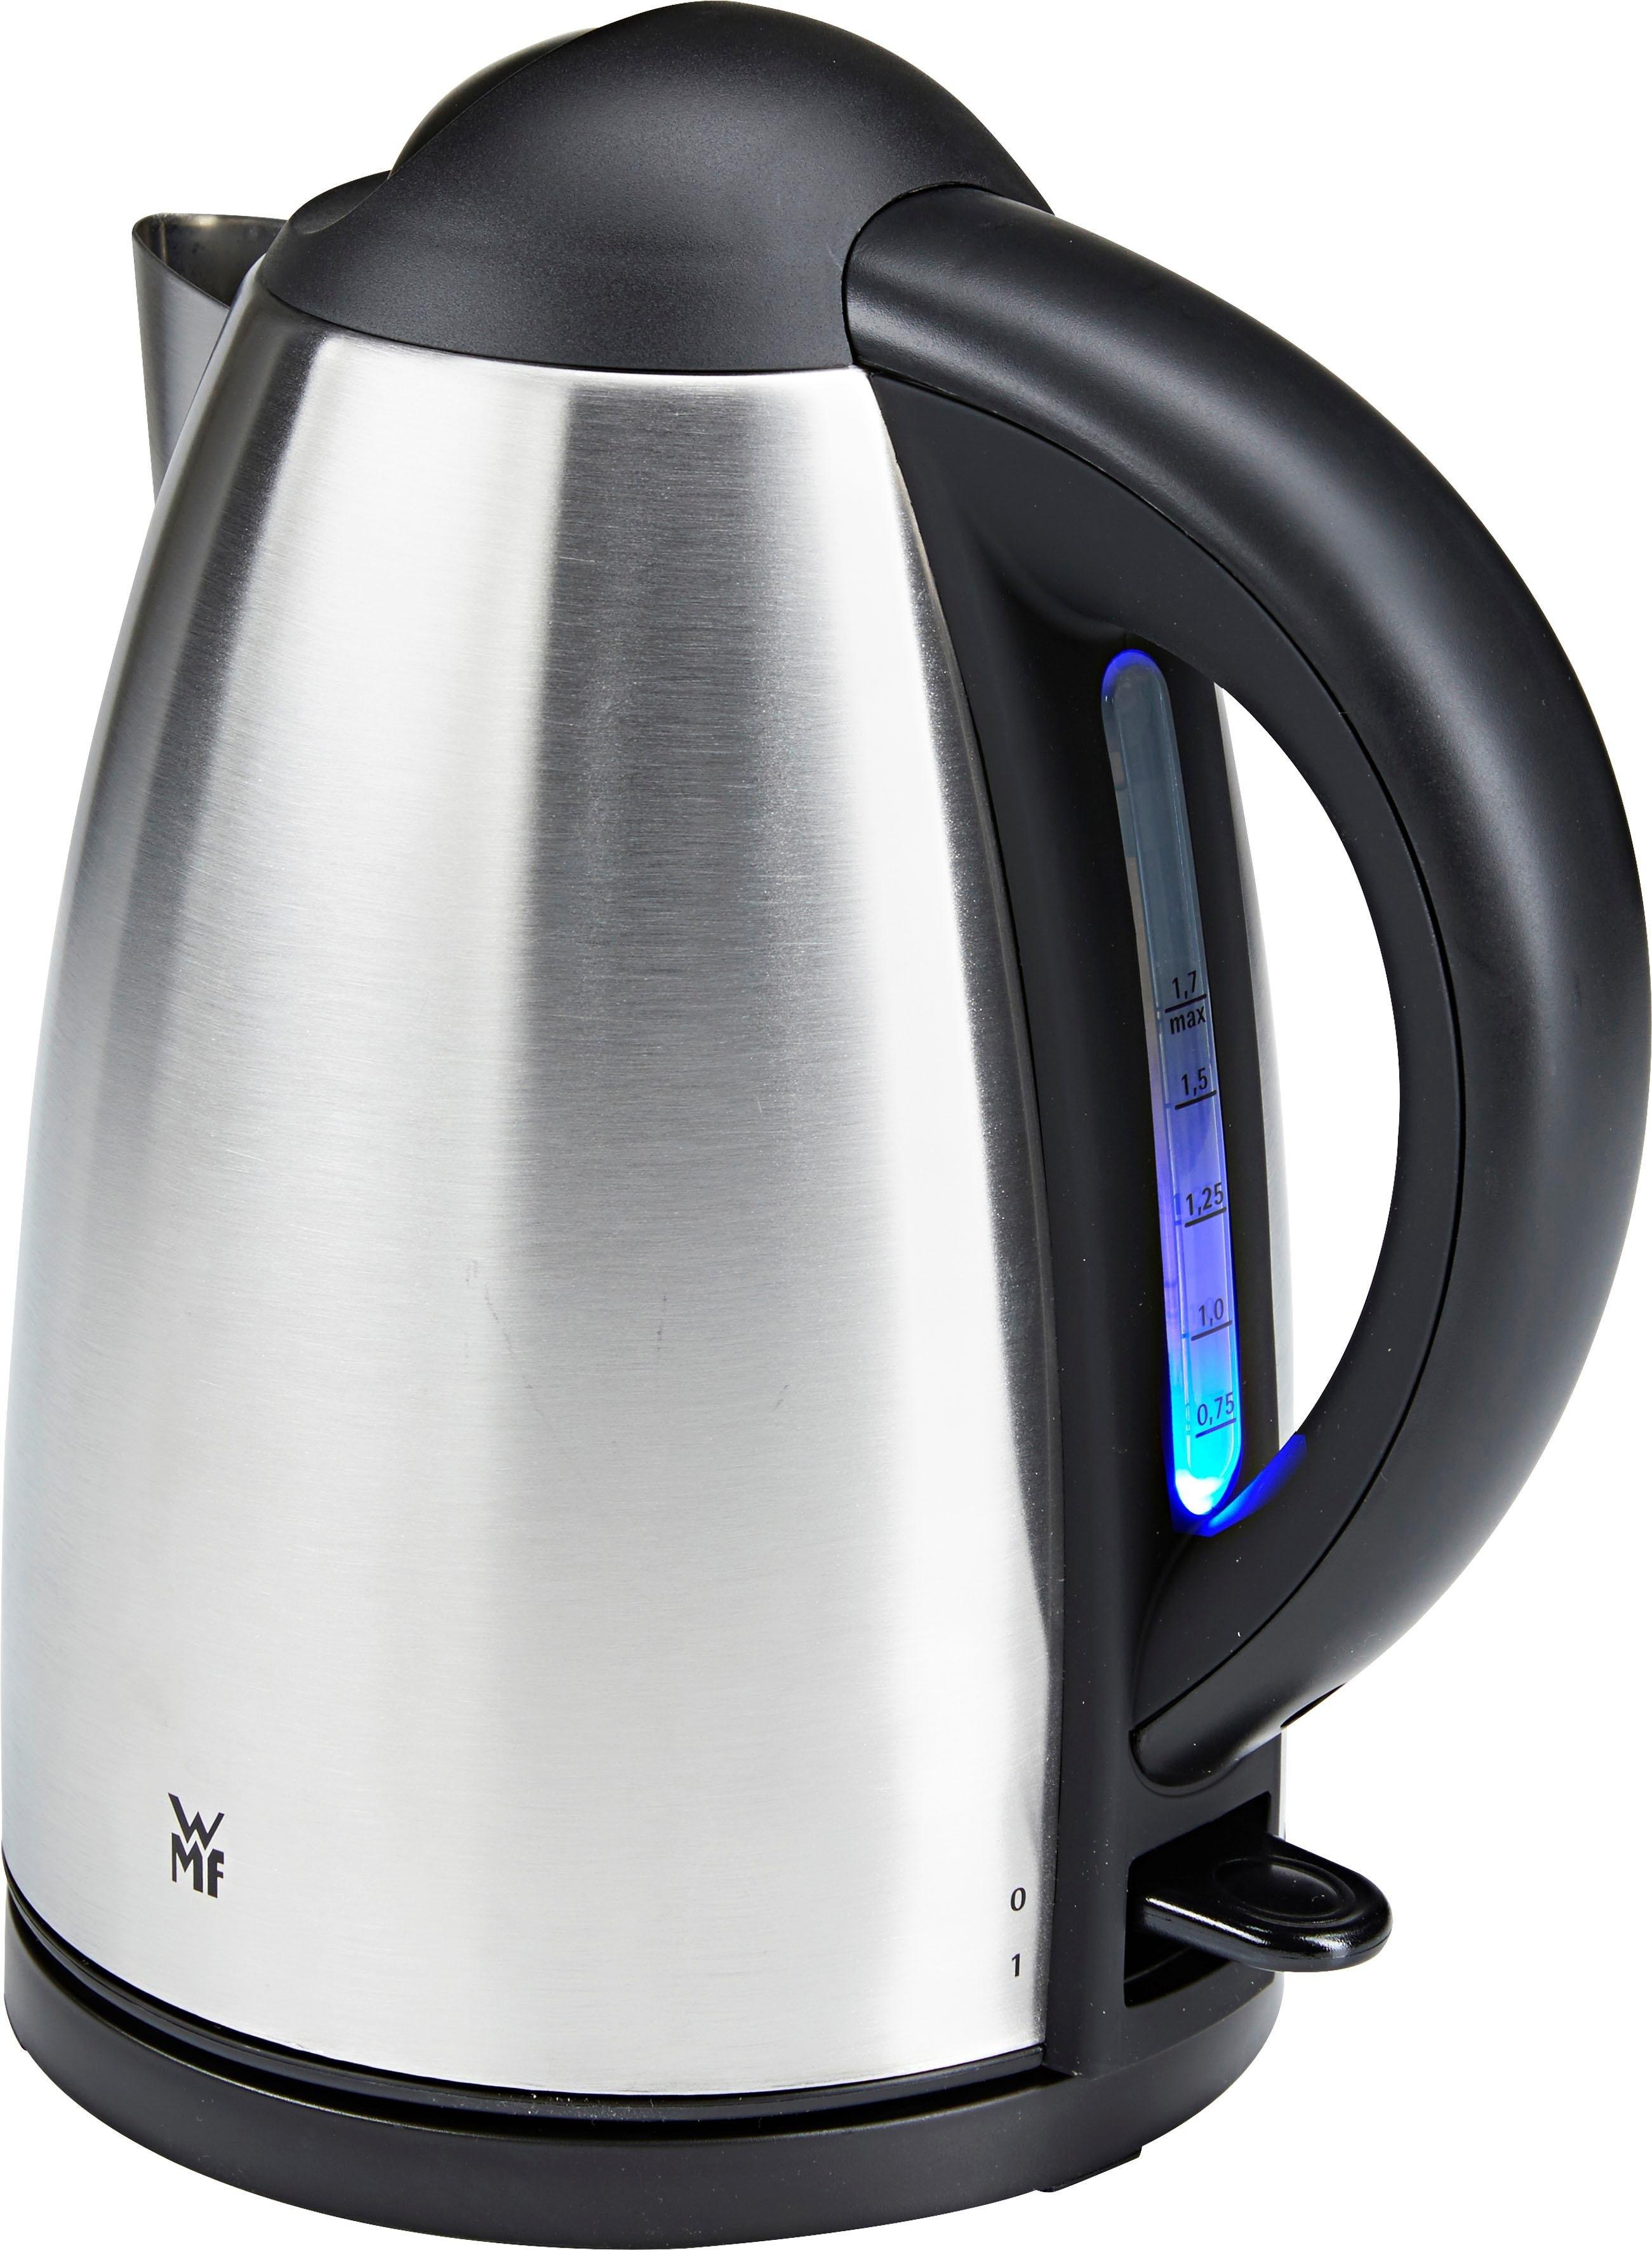 WMF waterkoker, BUENO, 1,7 liter, 2400 watt nu online bestellen